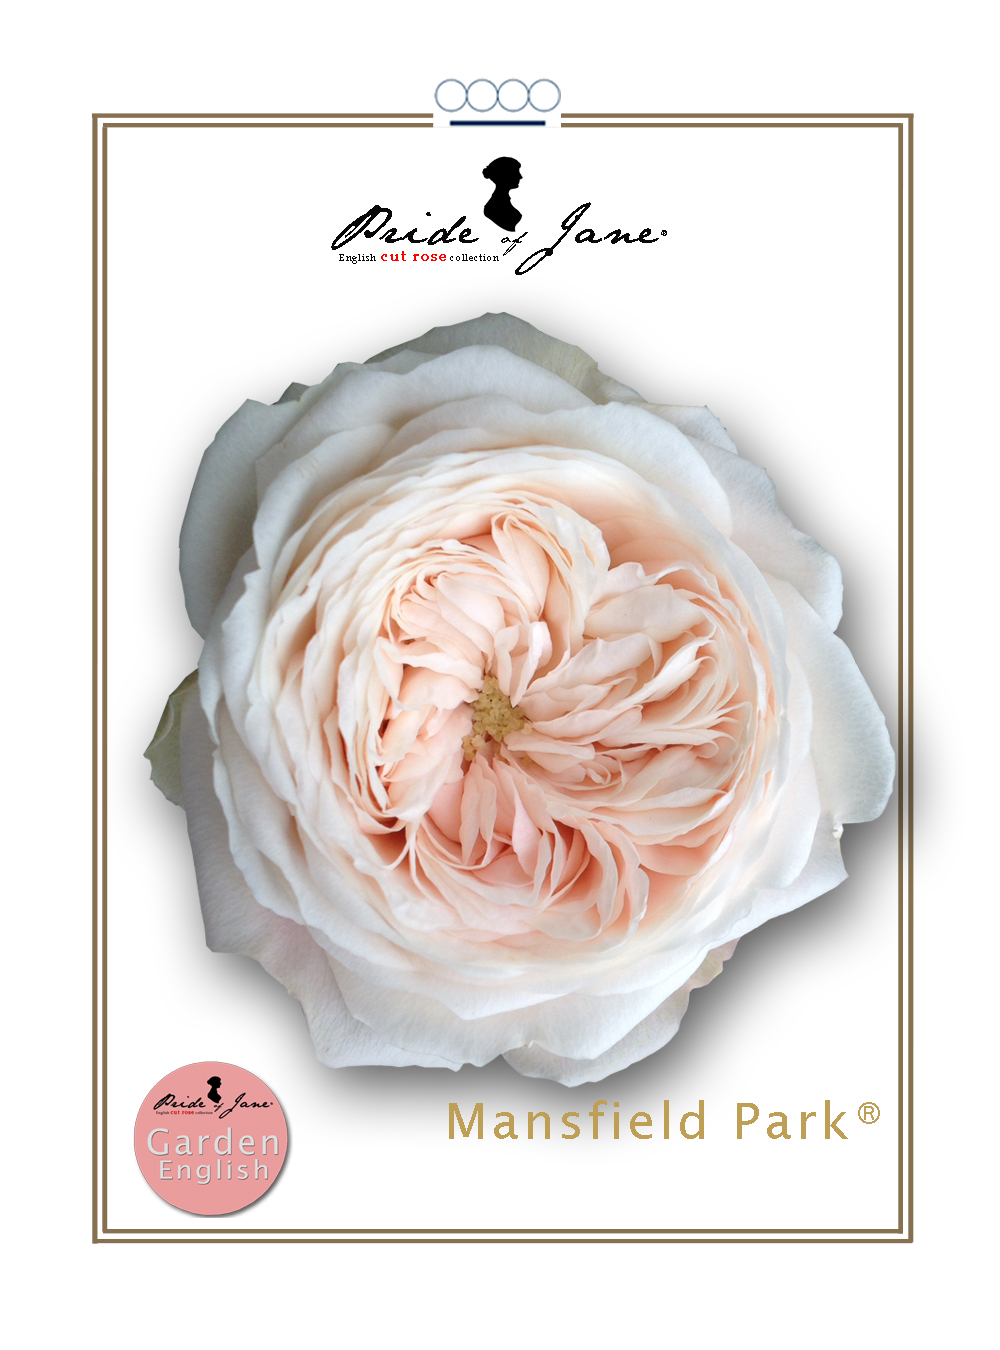 Mansfield Park®